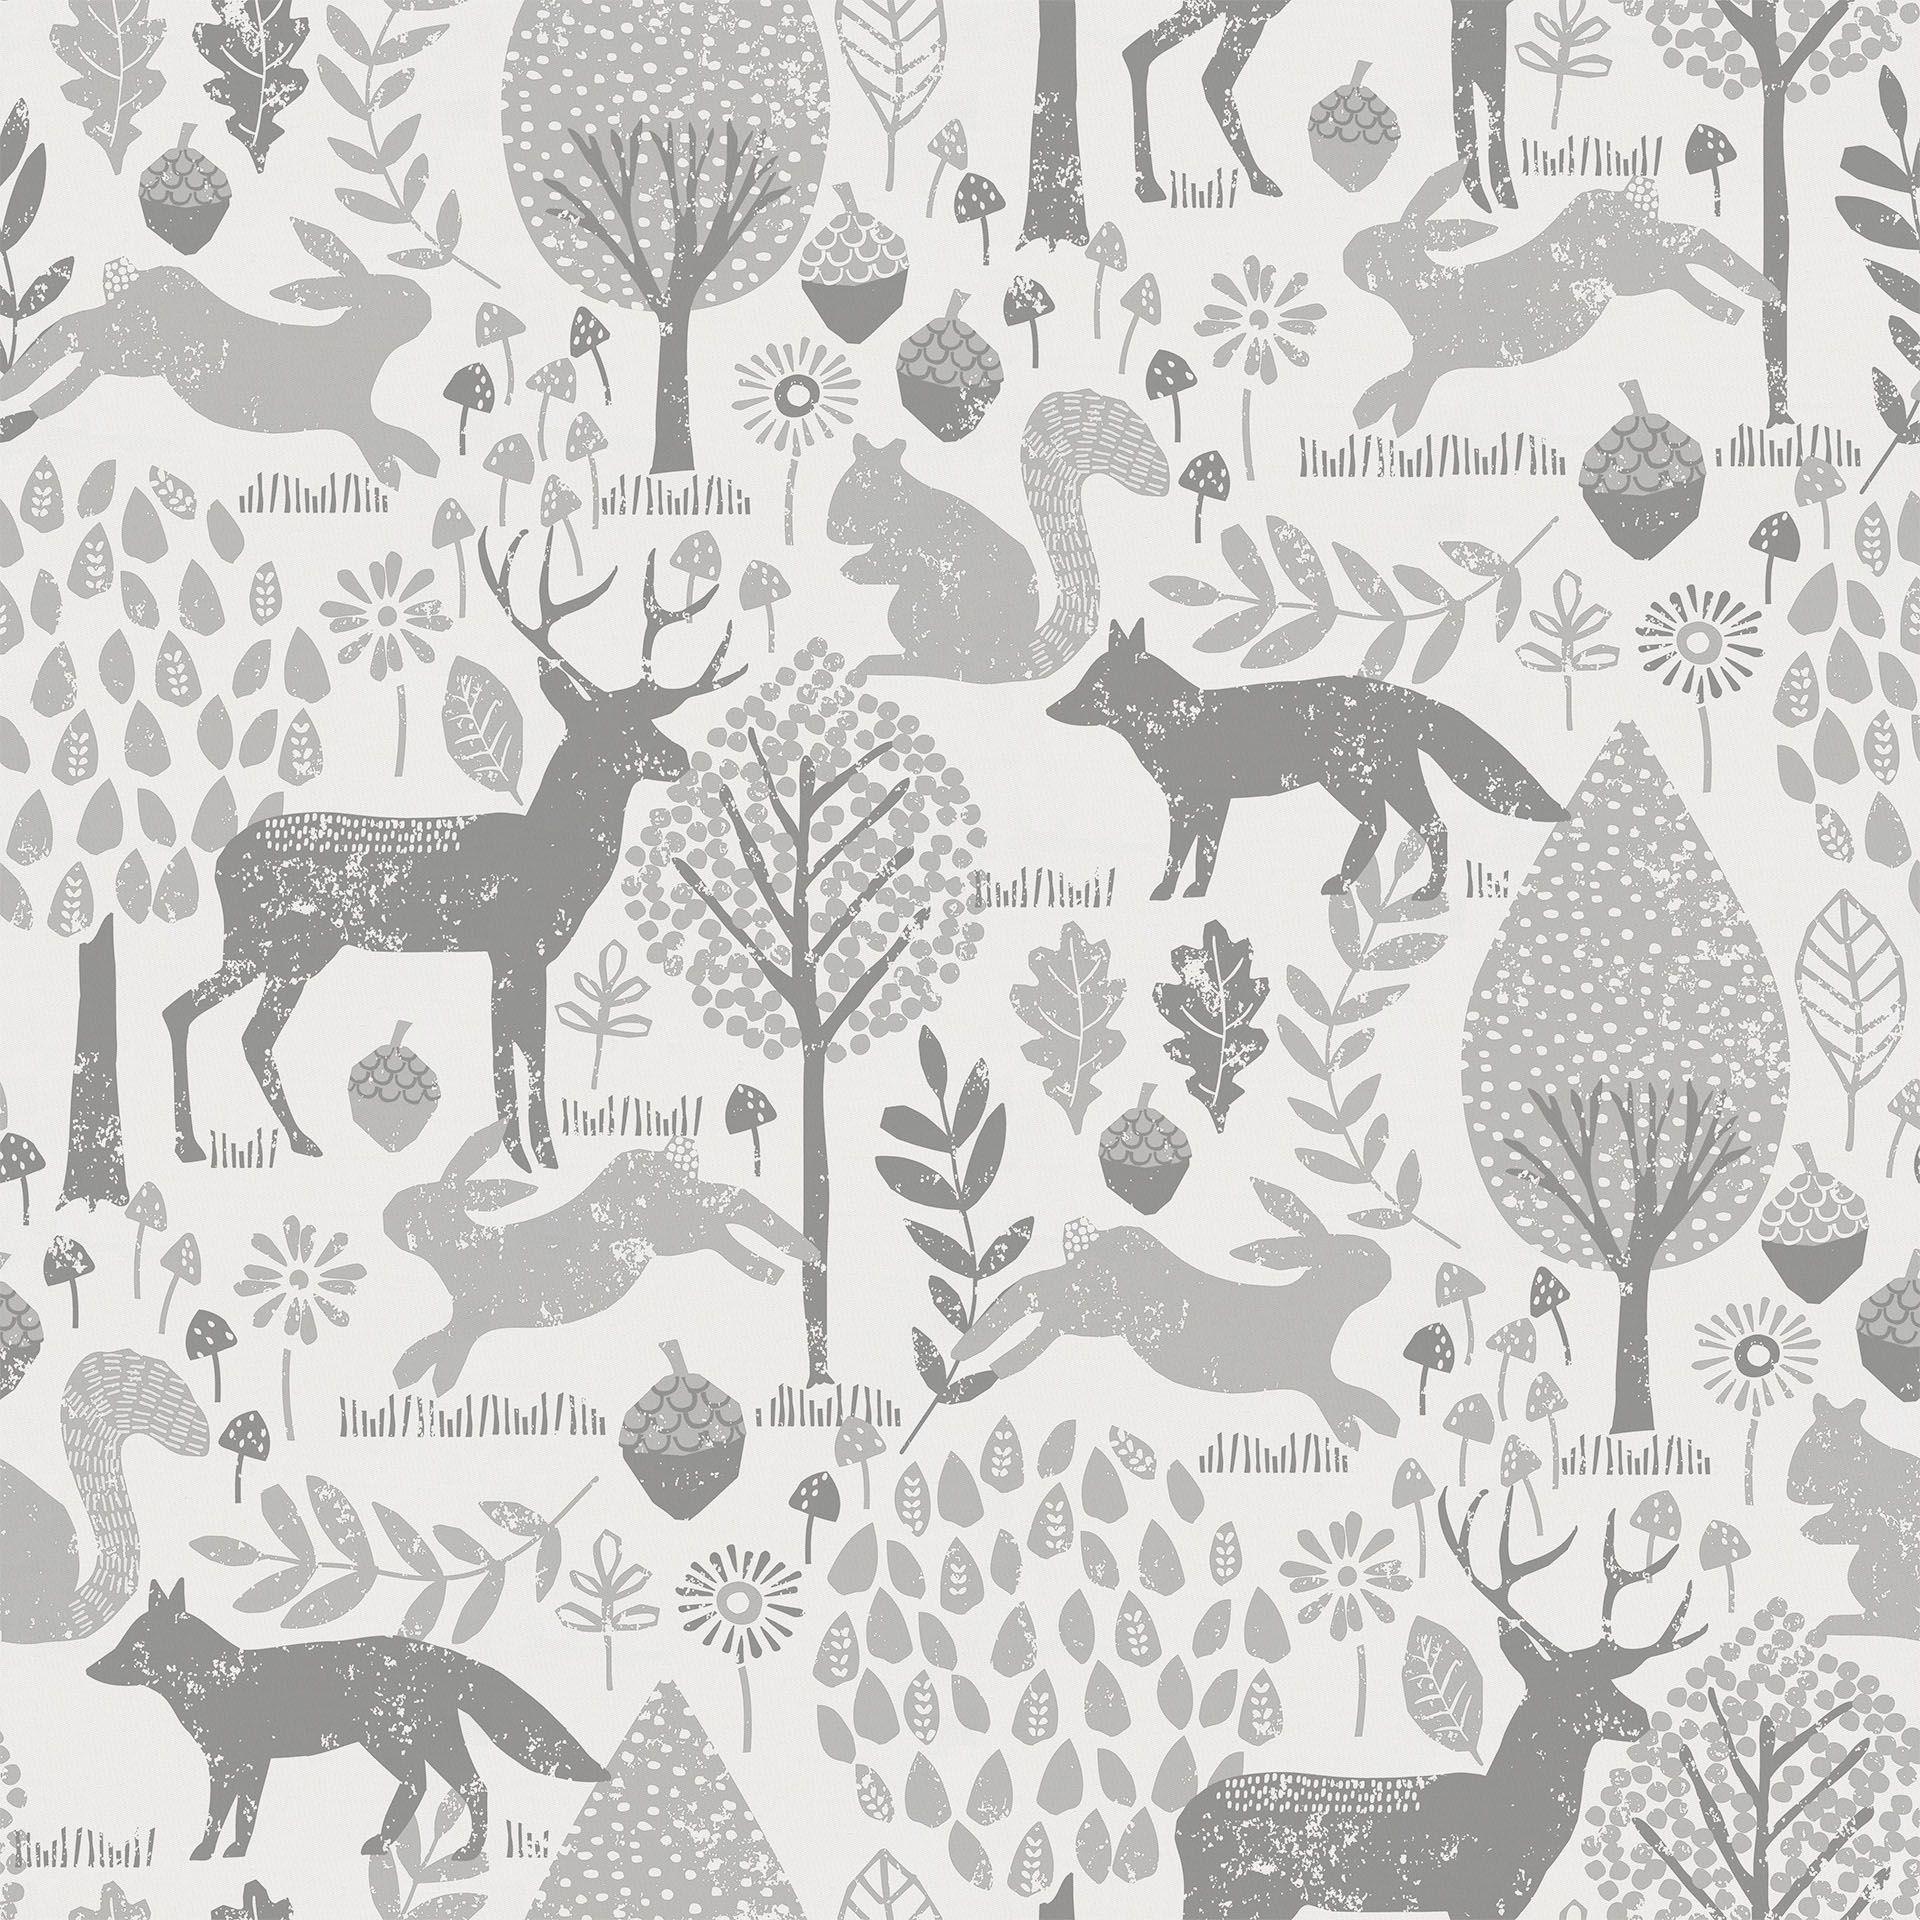 Gray Woodland Animals Fabric By The Yard